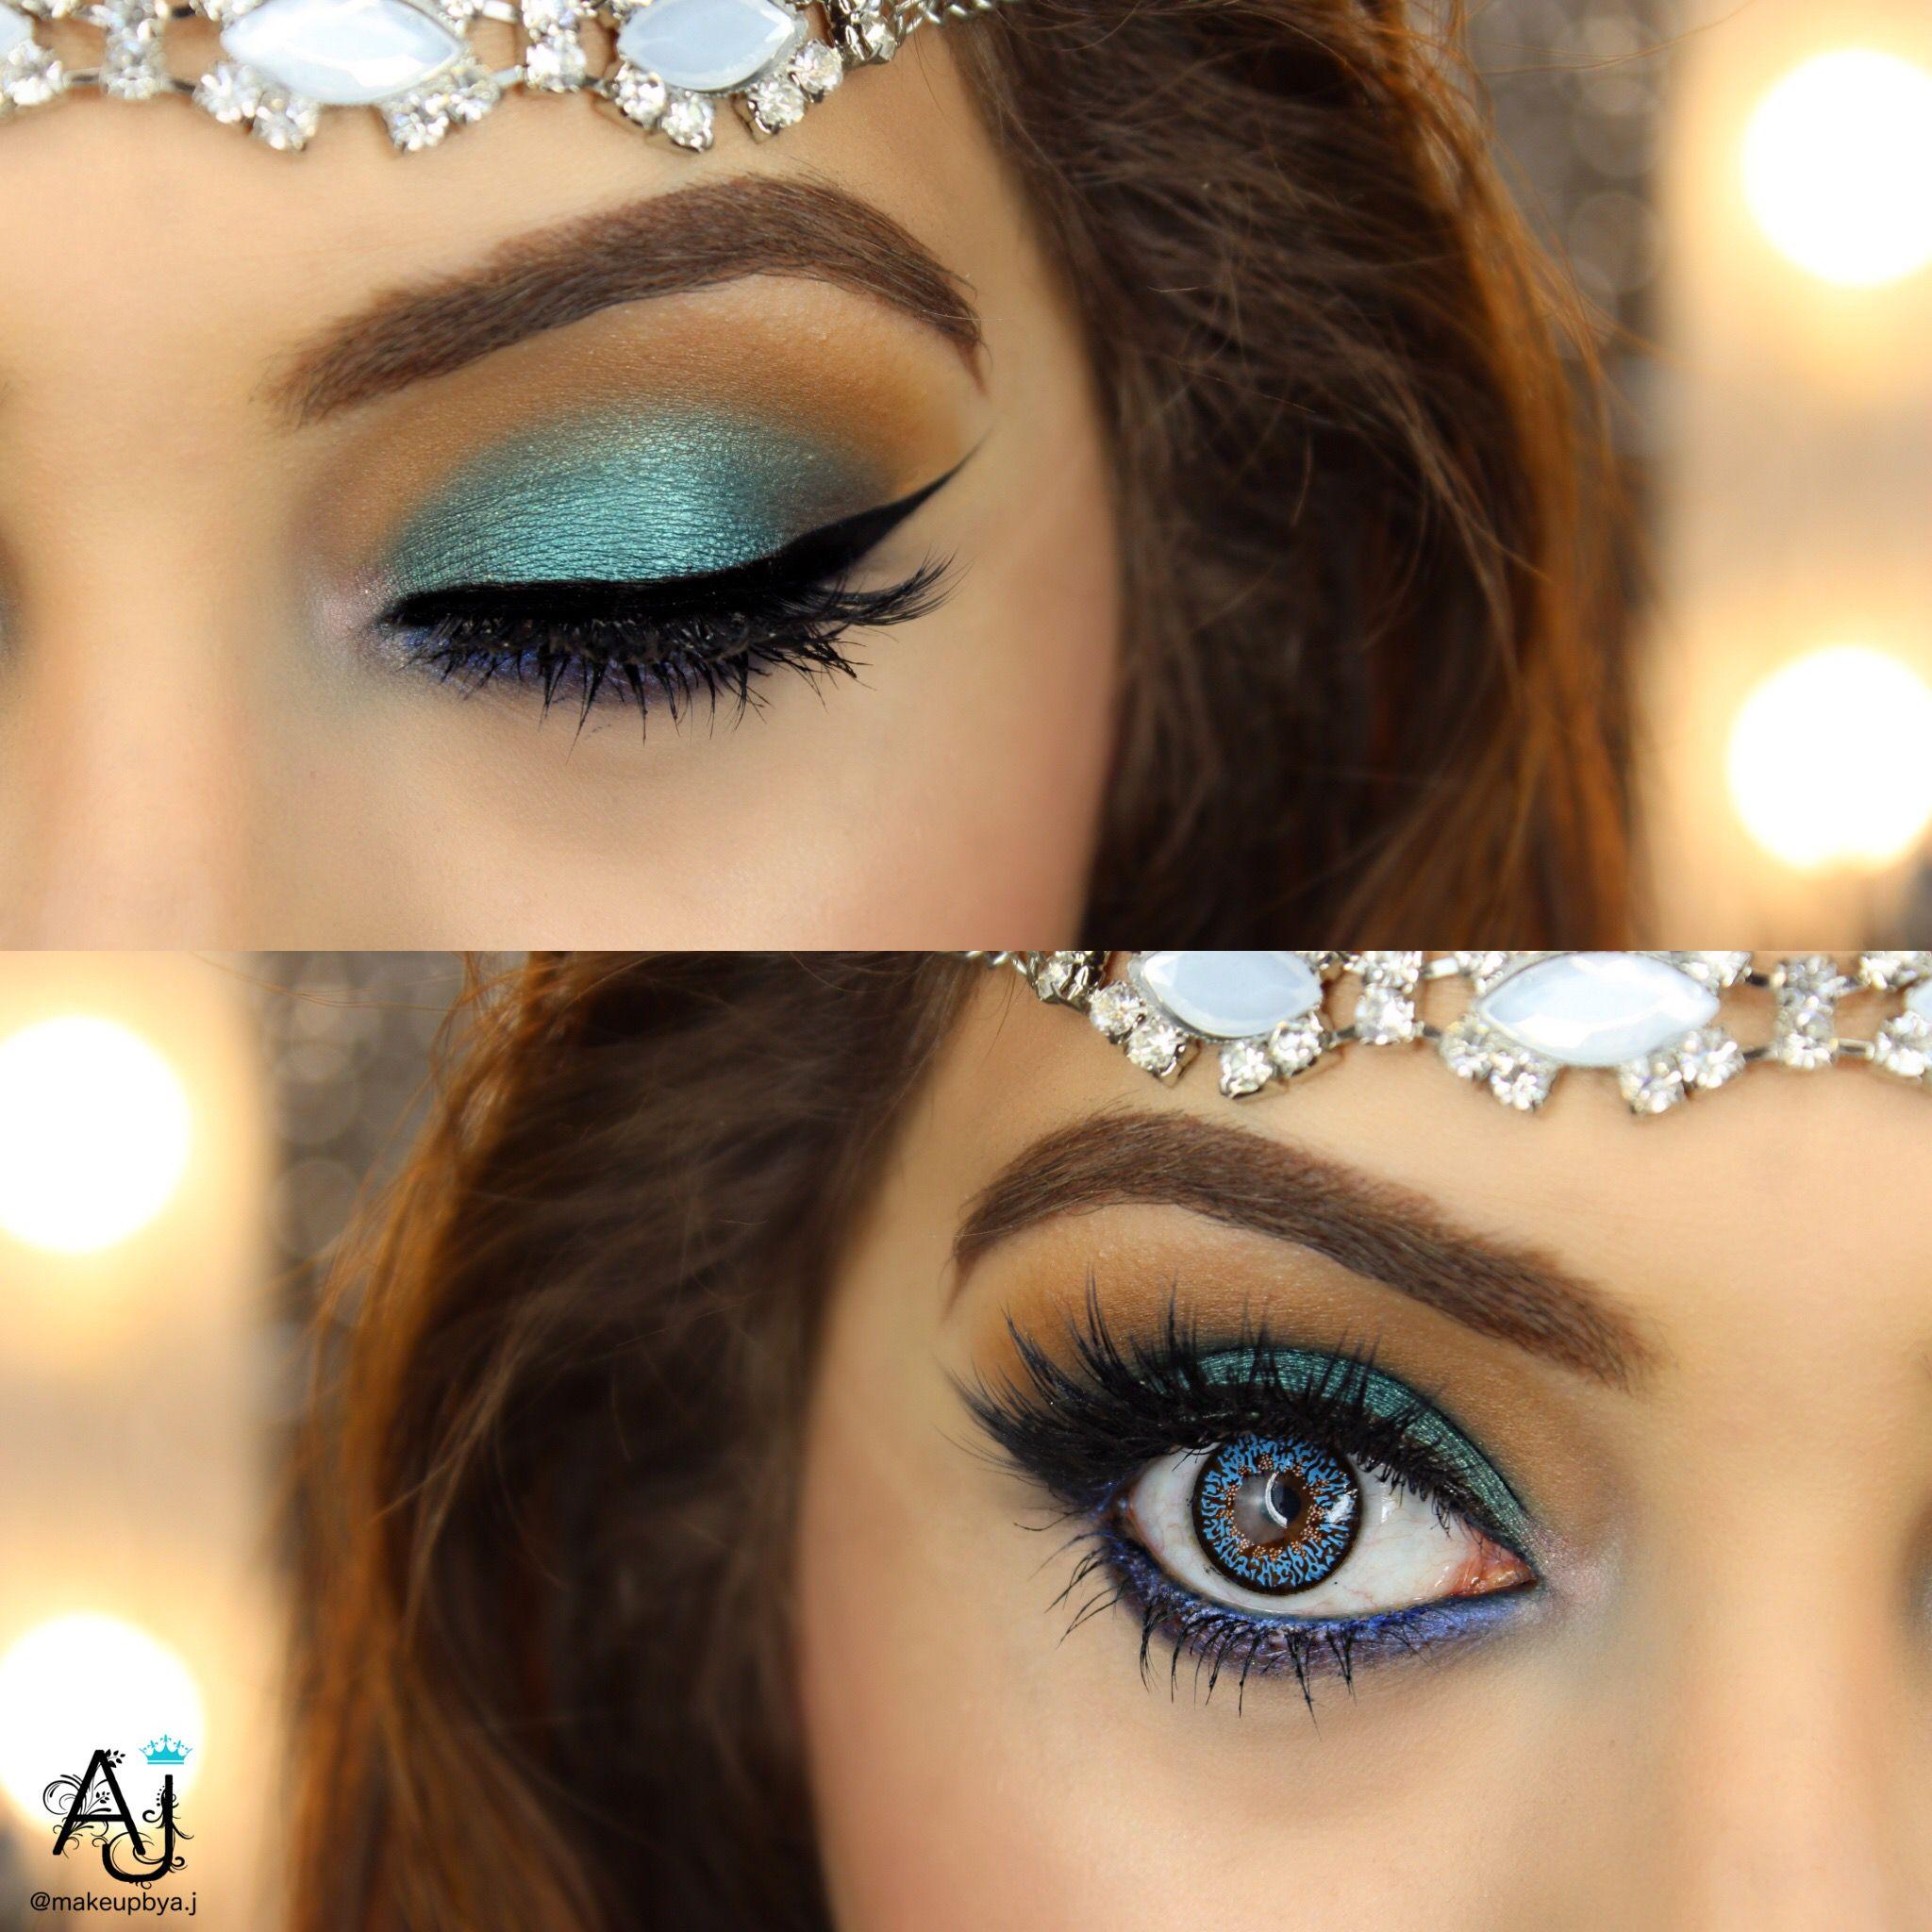 Teal Blue/ Green eye makeup eyeshadow look created using